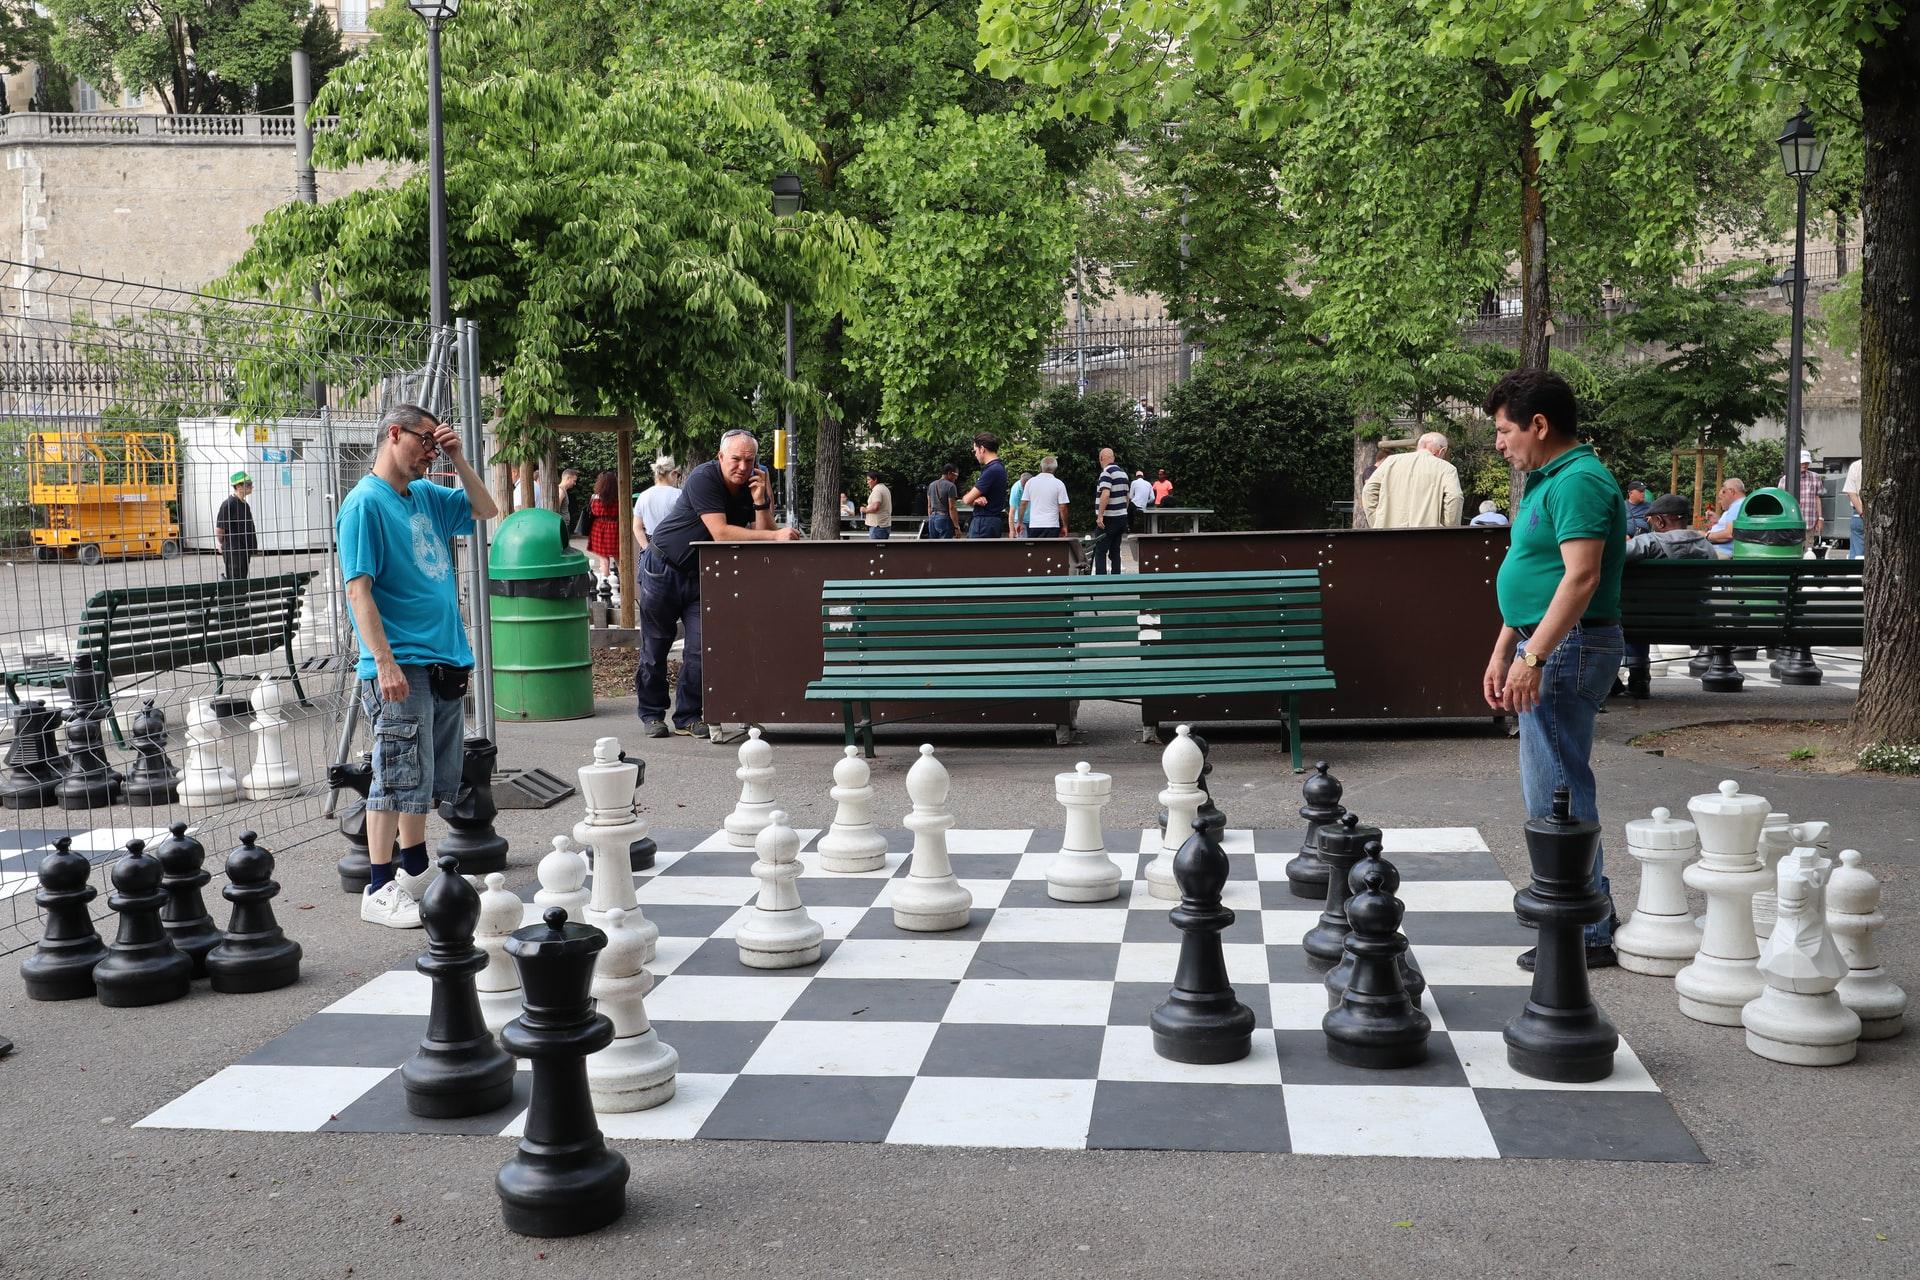 carol jeng c04CrVbw56o unsplash - Vorteile des Schachspiels